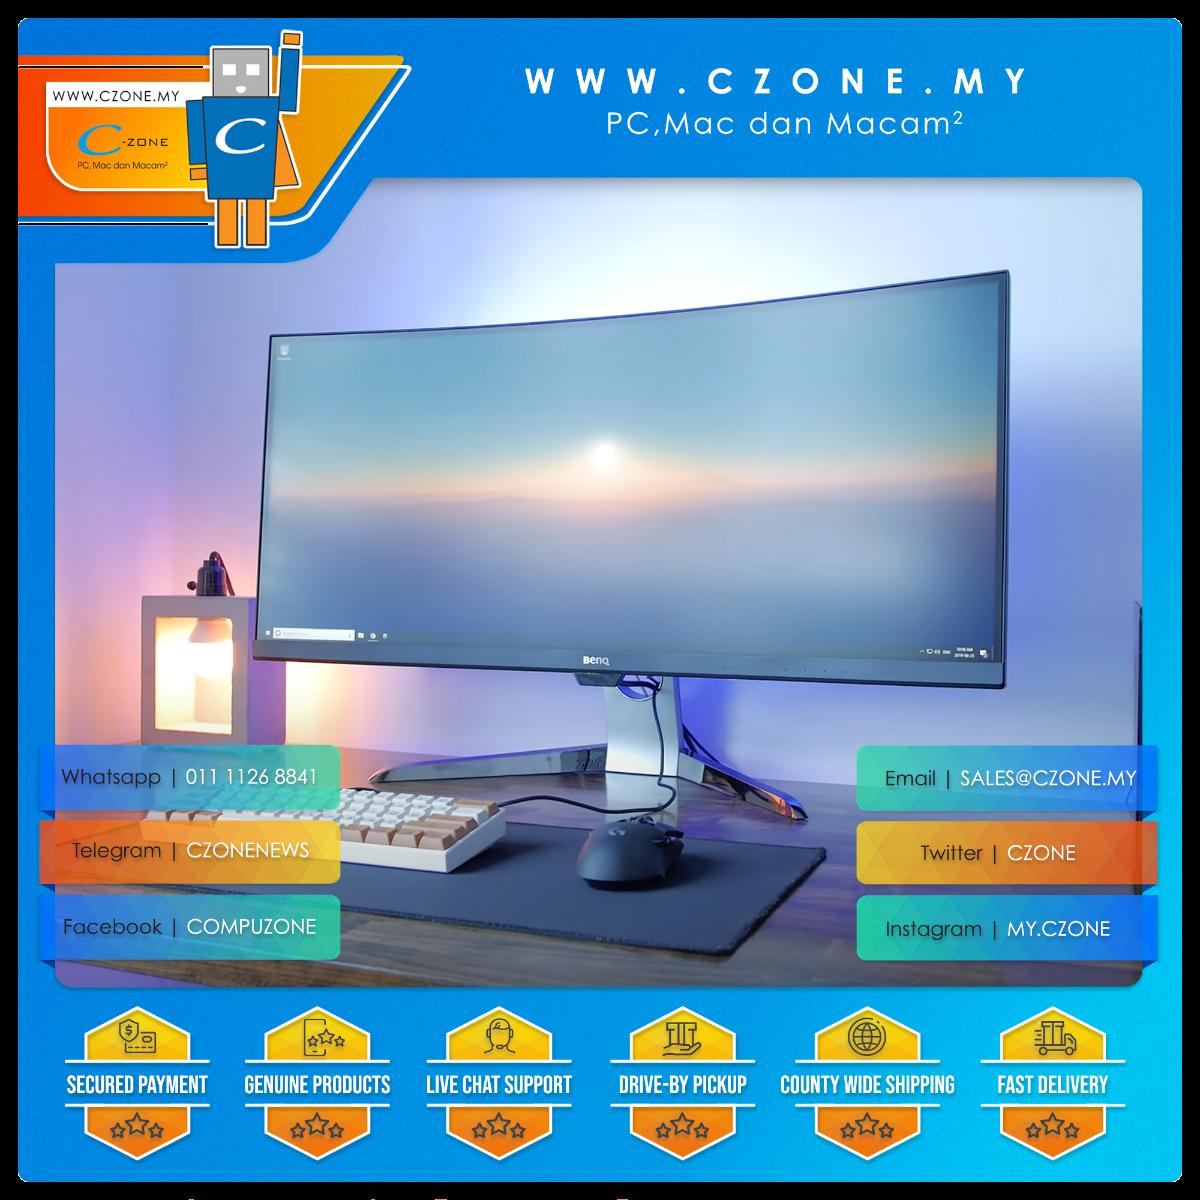 https://czone.my/czone/computer-components/monitors.html